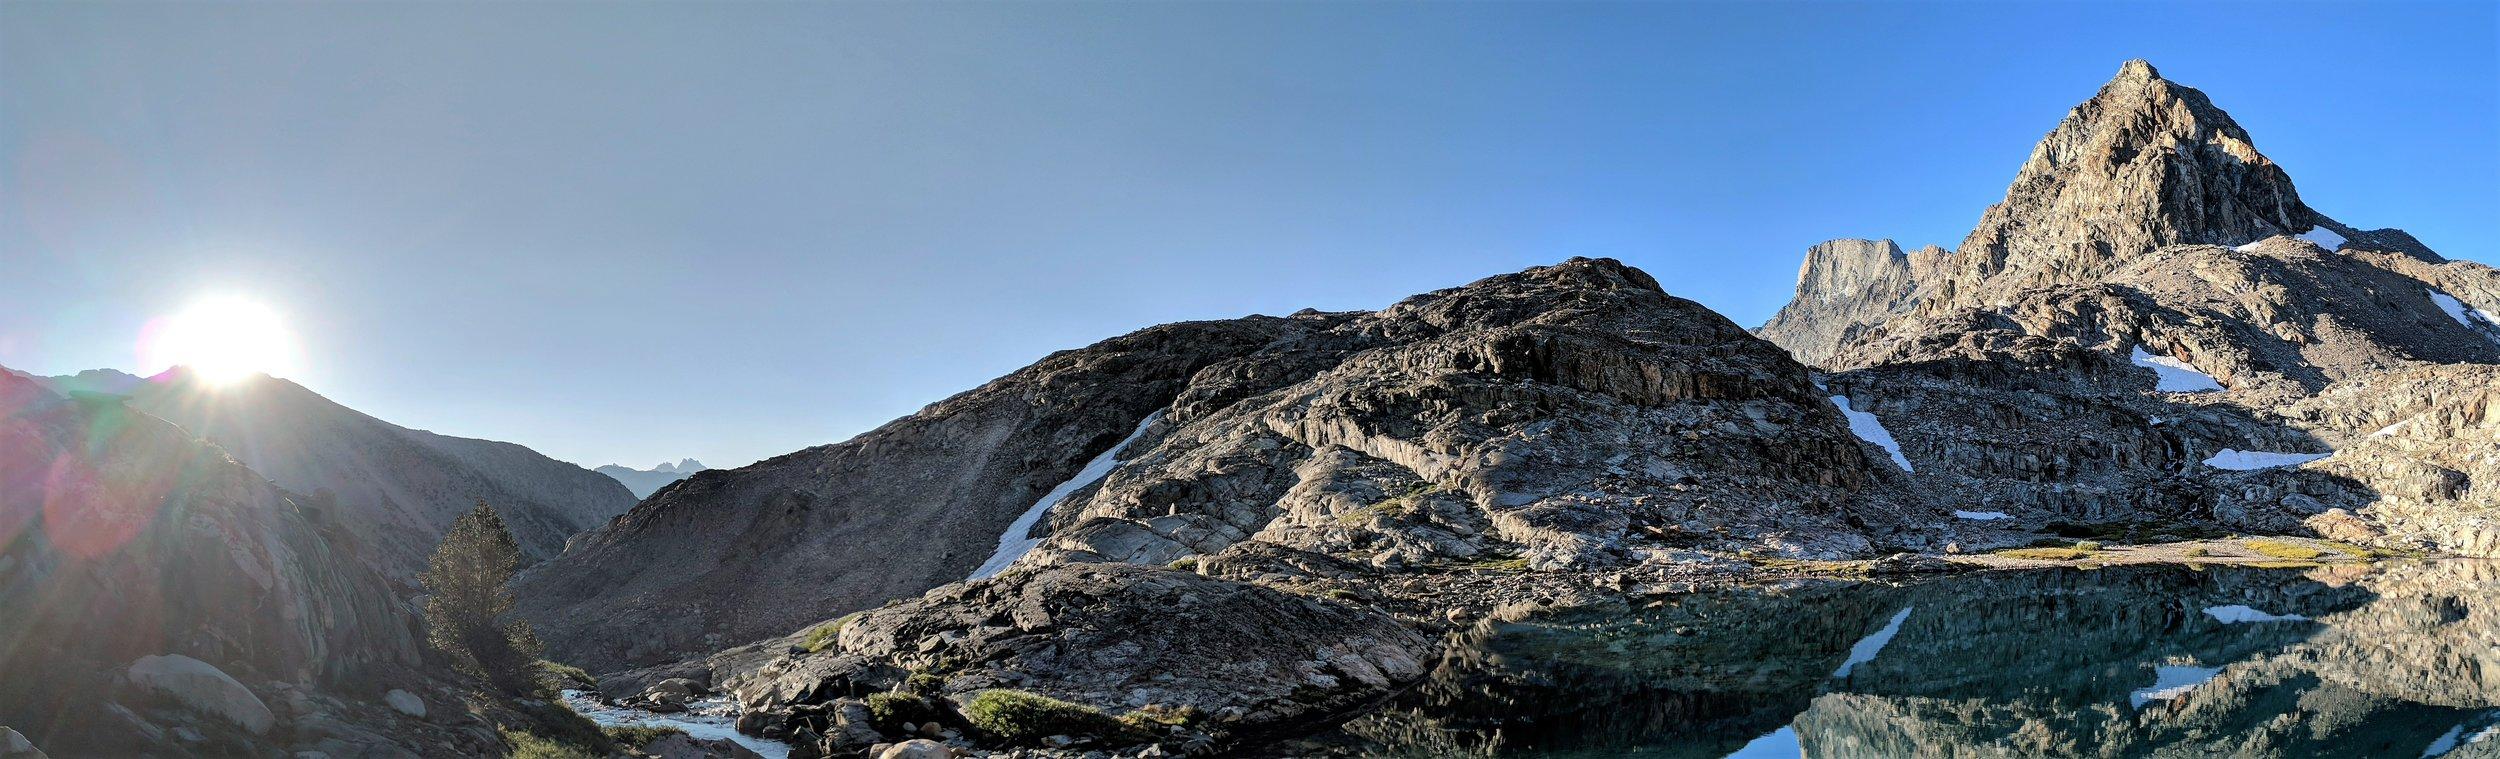 Muir peak at sunrise